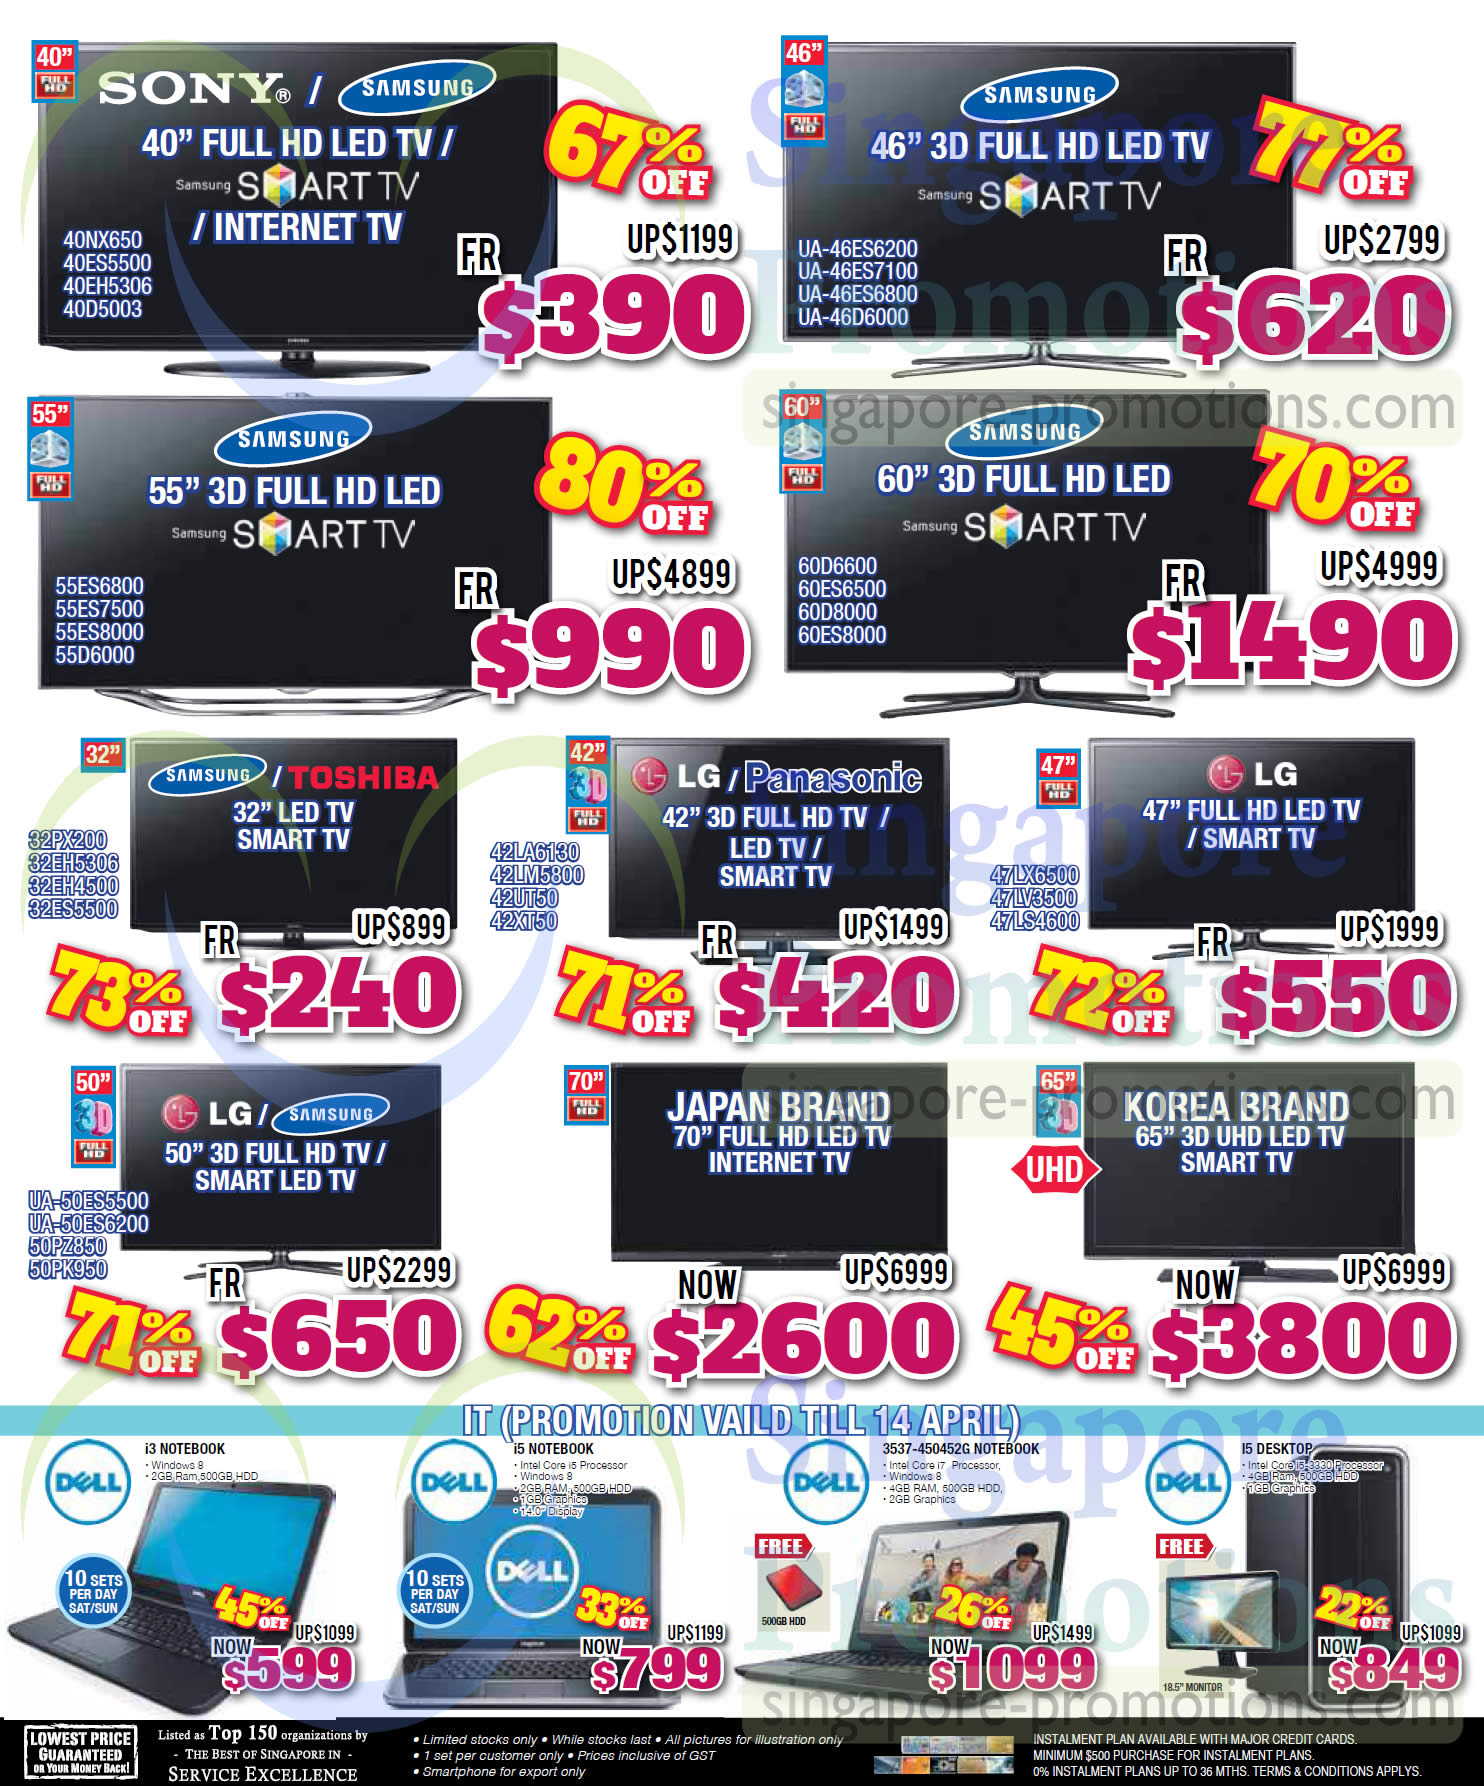 TVs, Notebooks, Sony, Samsung, Toshiba, LG, Panasonic, Dell